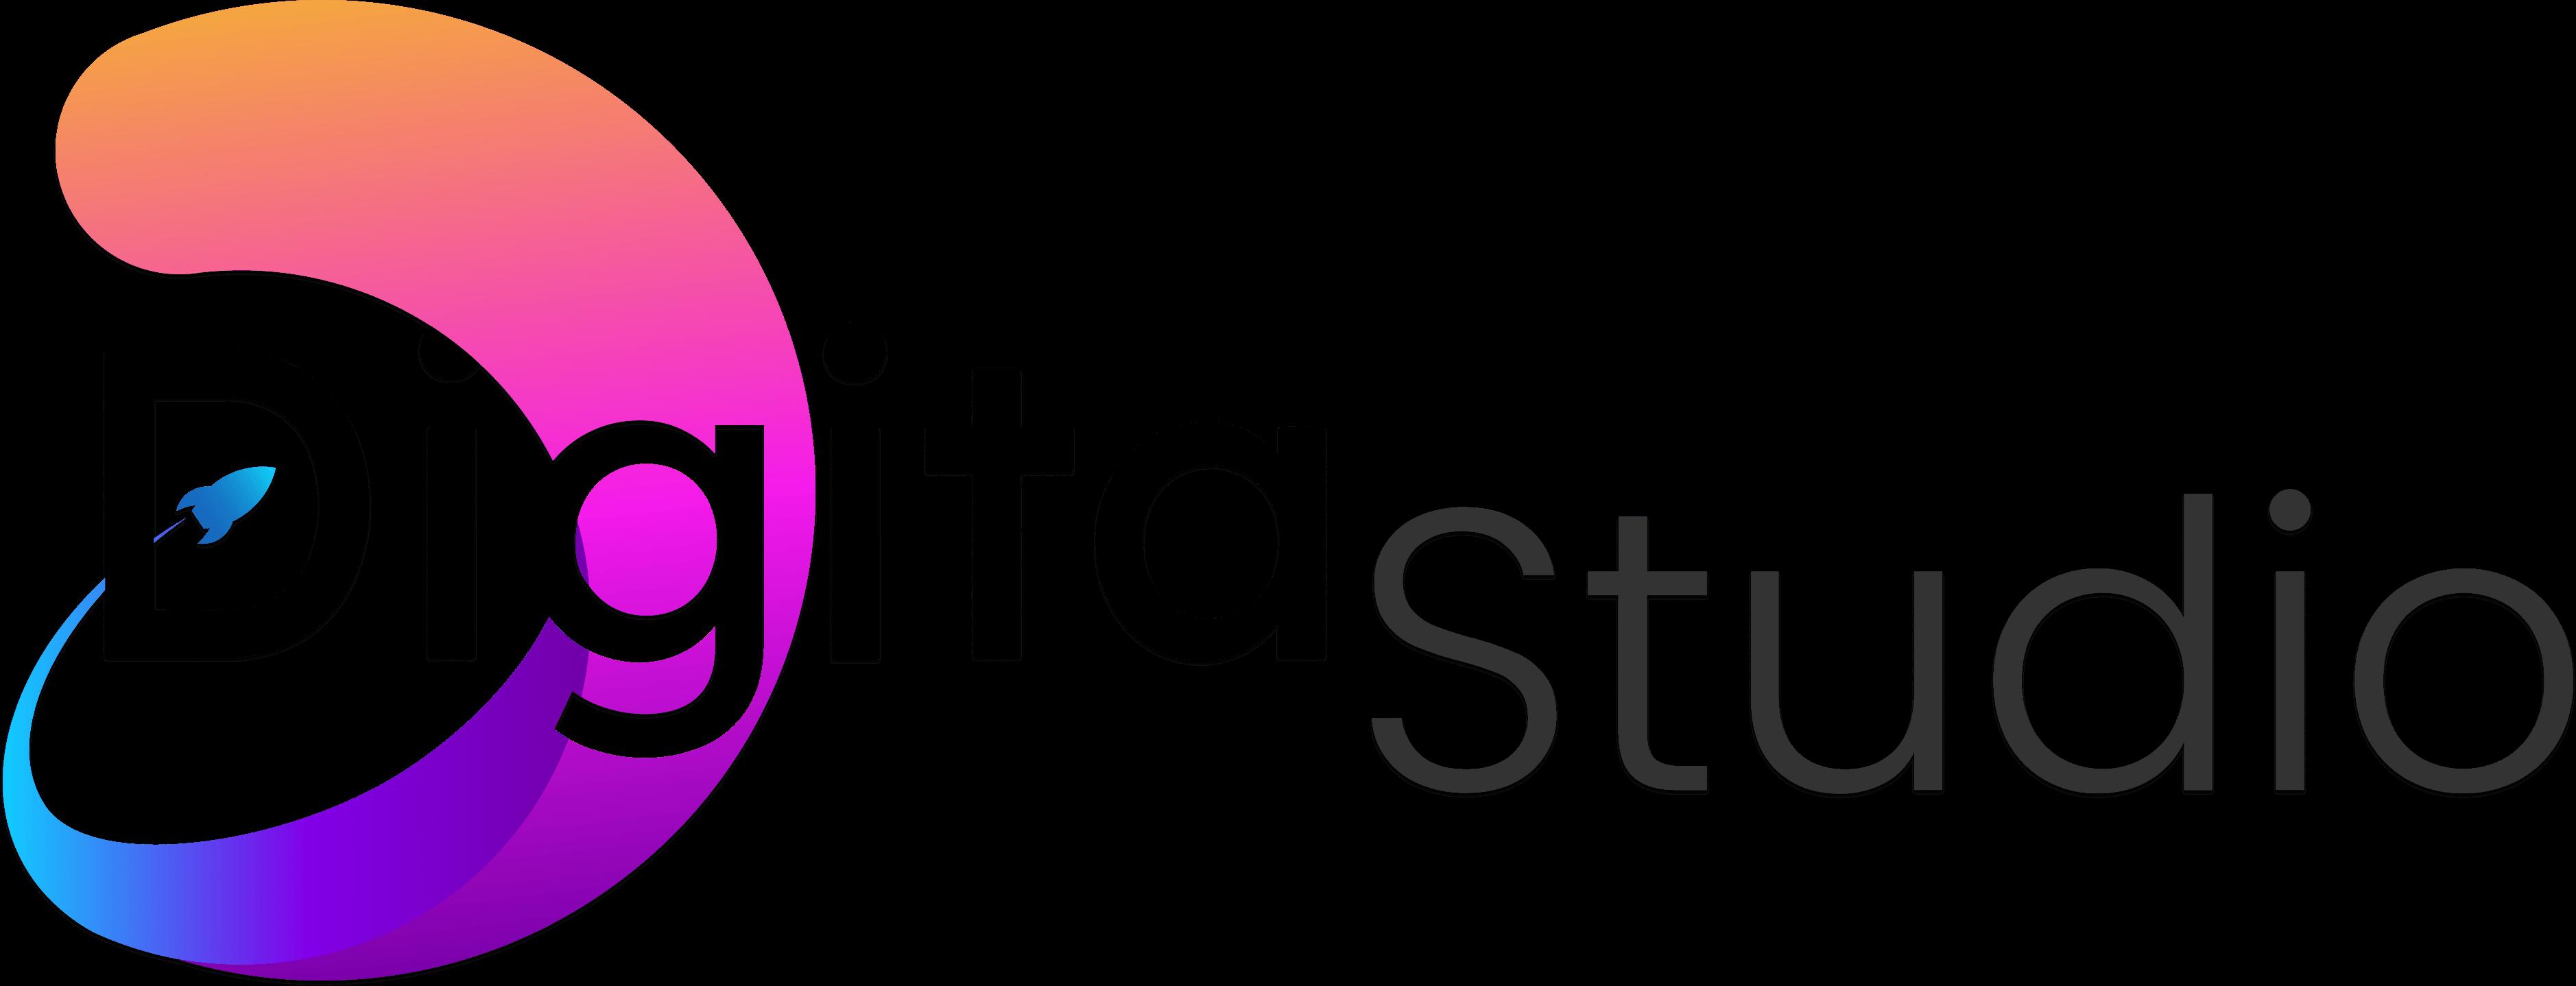 Digita Studio Logotipo